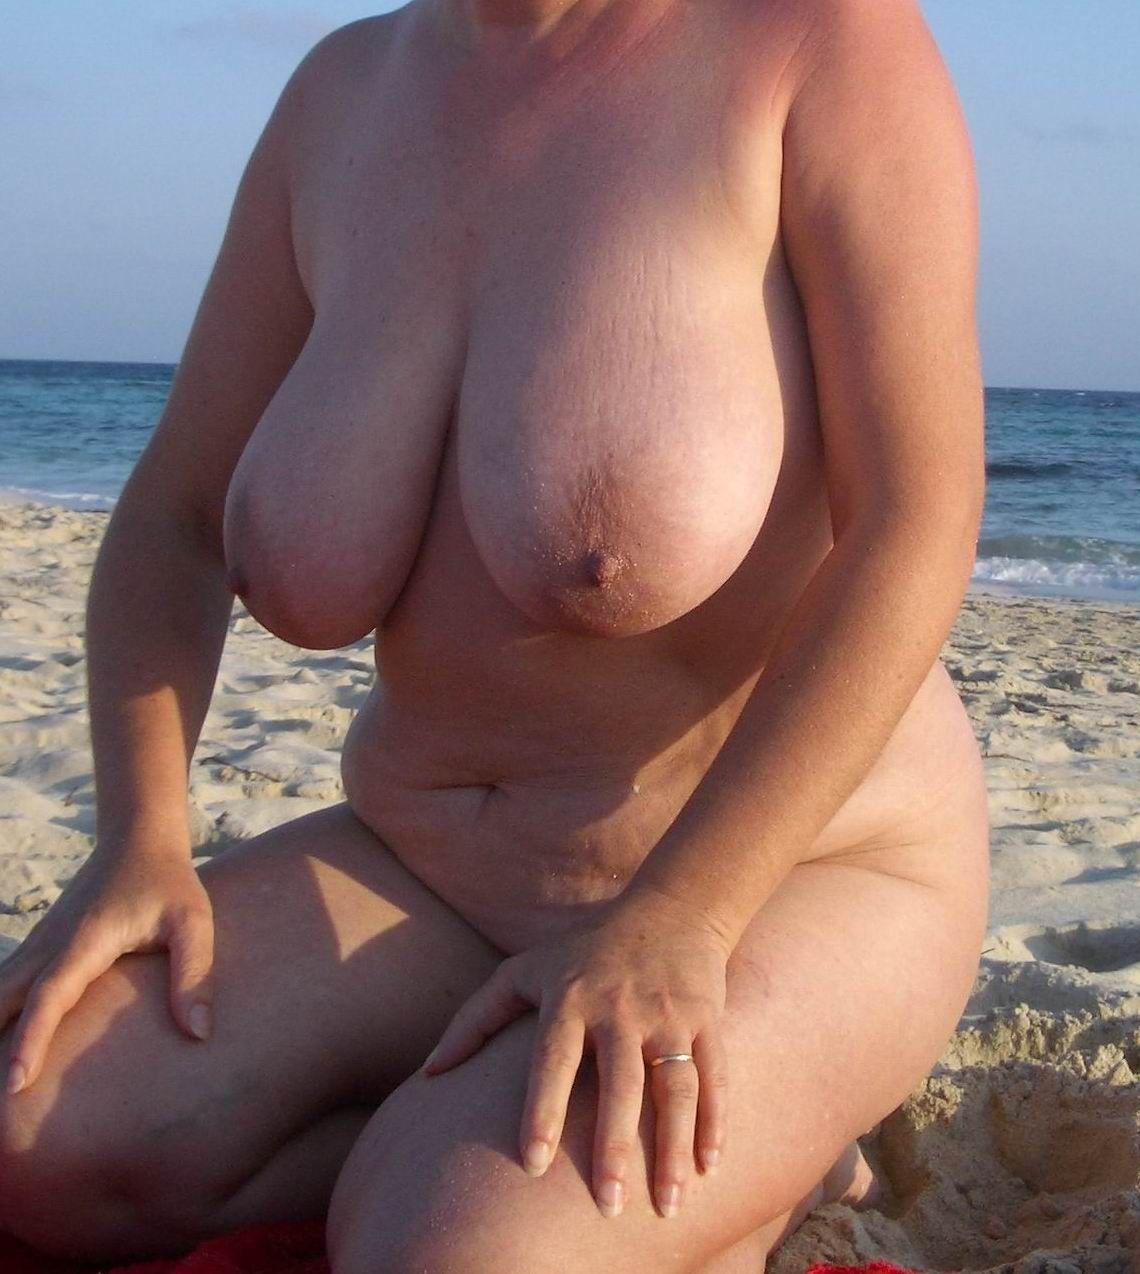 Mujeres Maduras Muy Calientes mi mujer tetona en playa nudista | universo erótico